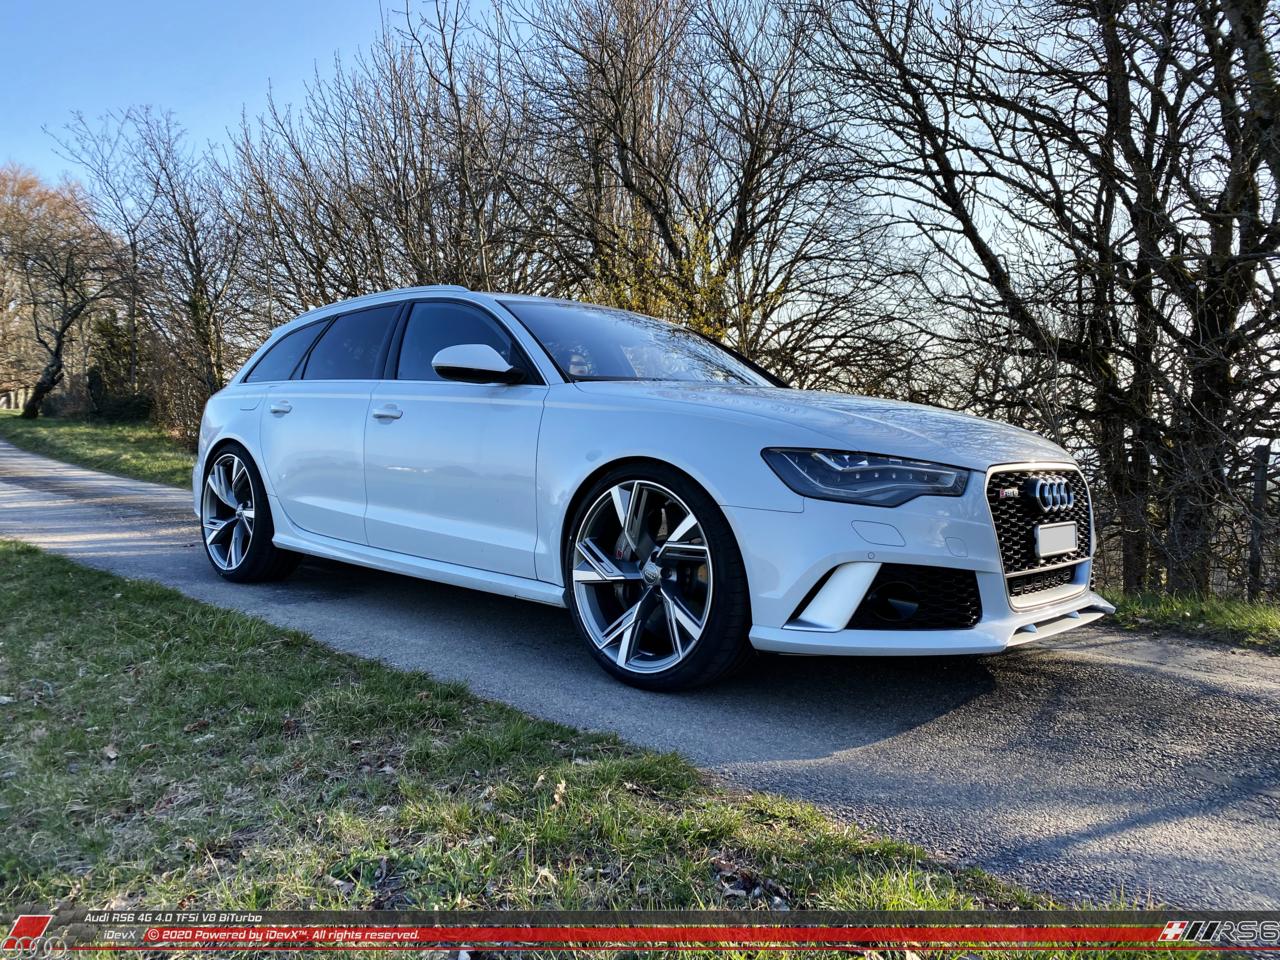 18.03.2020_Audi-RS6_iDevX_006.png